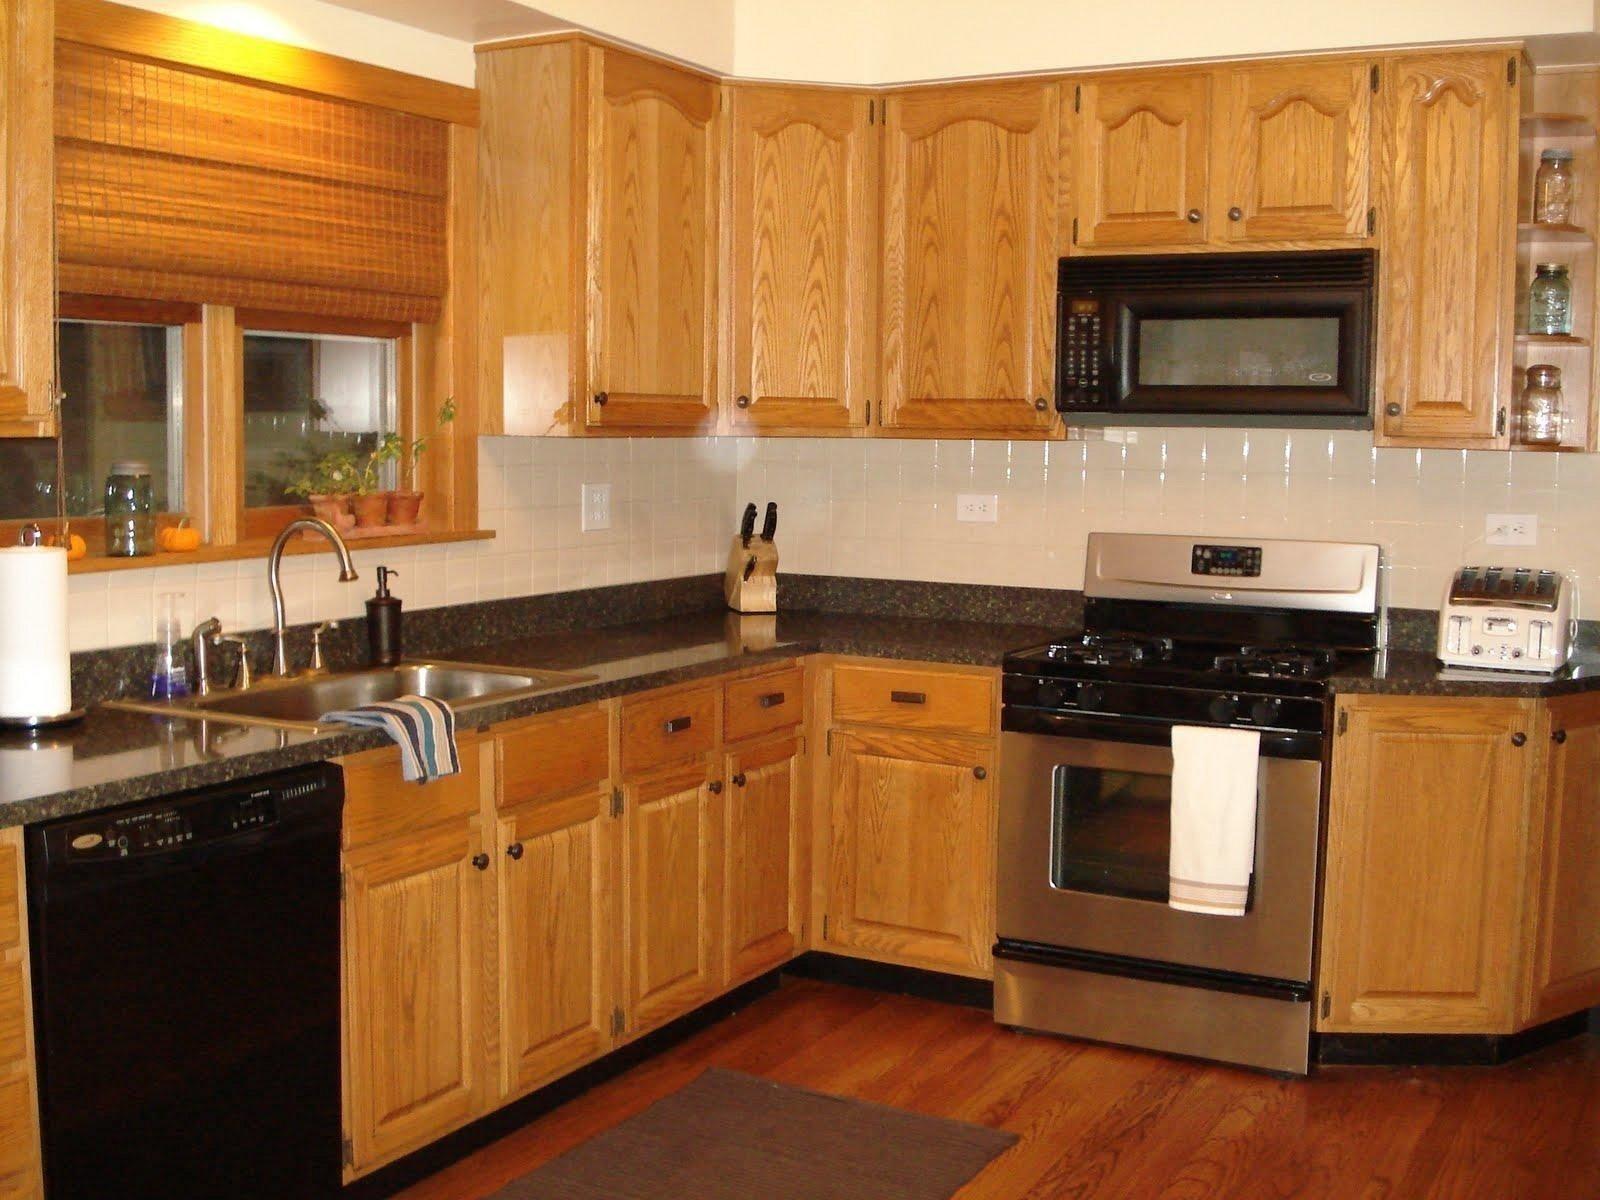 10 Best Kitchen Ideas With Oak Cabinets elegant oak cabinets kitchen ideas kitchen design ideas 2020